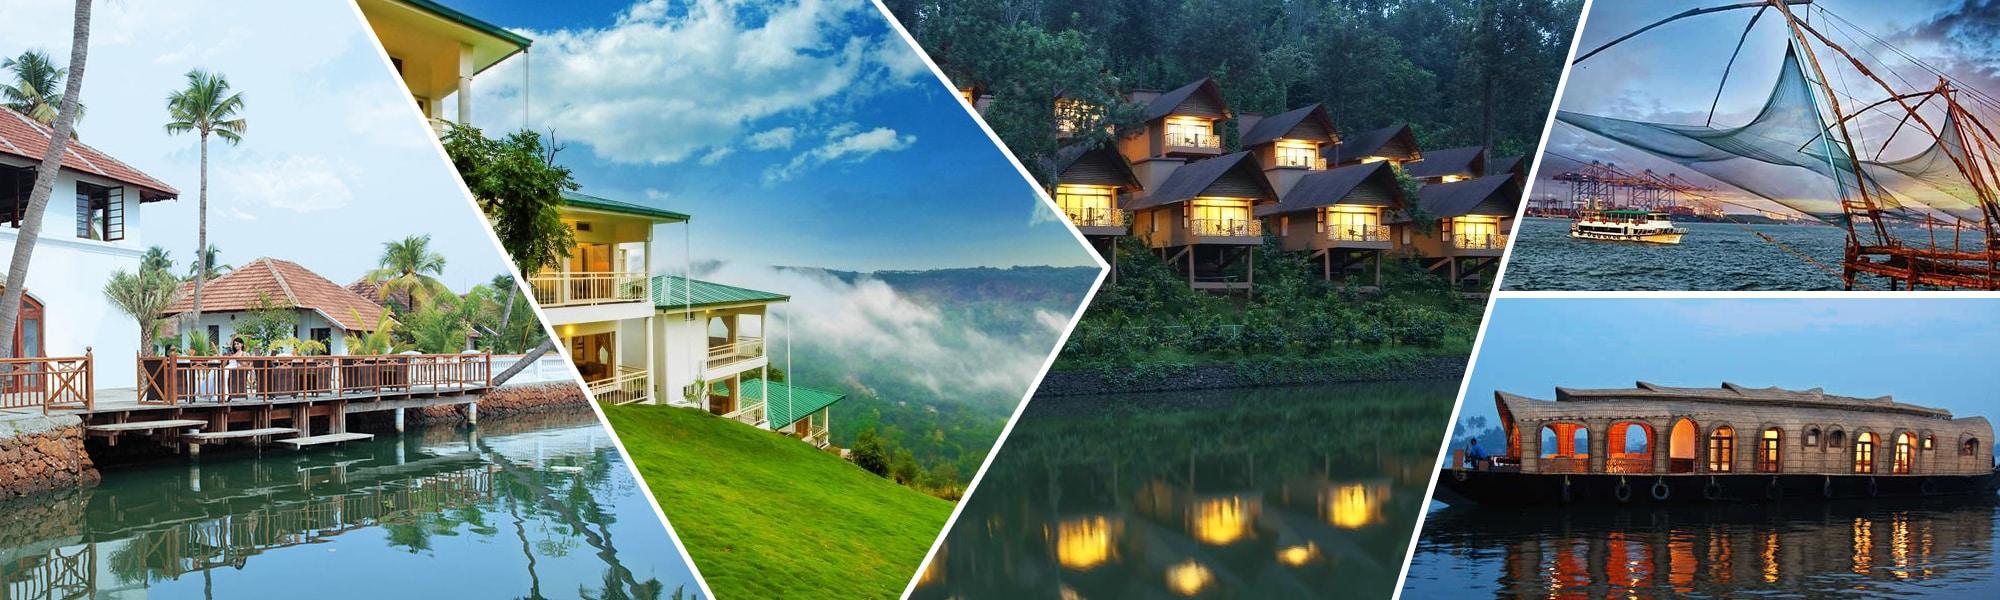 Cherai, Munnar, Thekkady, Alappuzha and Kochi – Funday Spectacular Package Tour